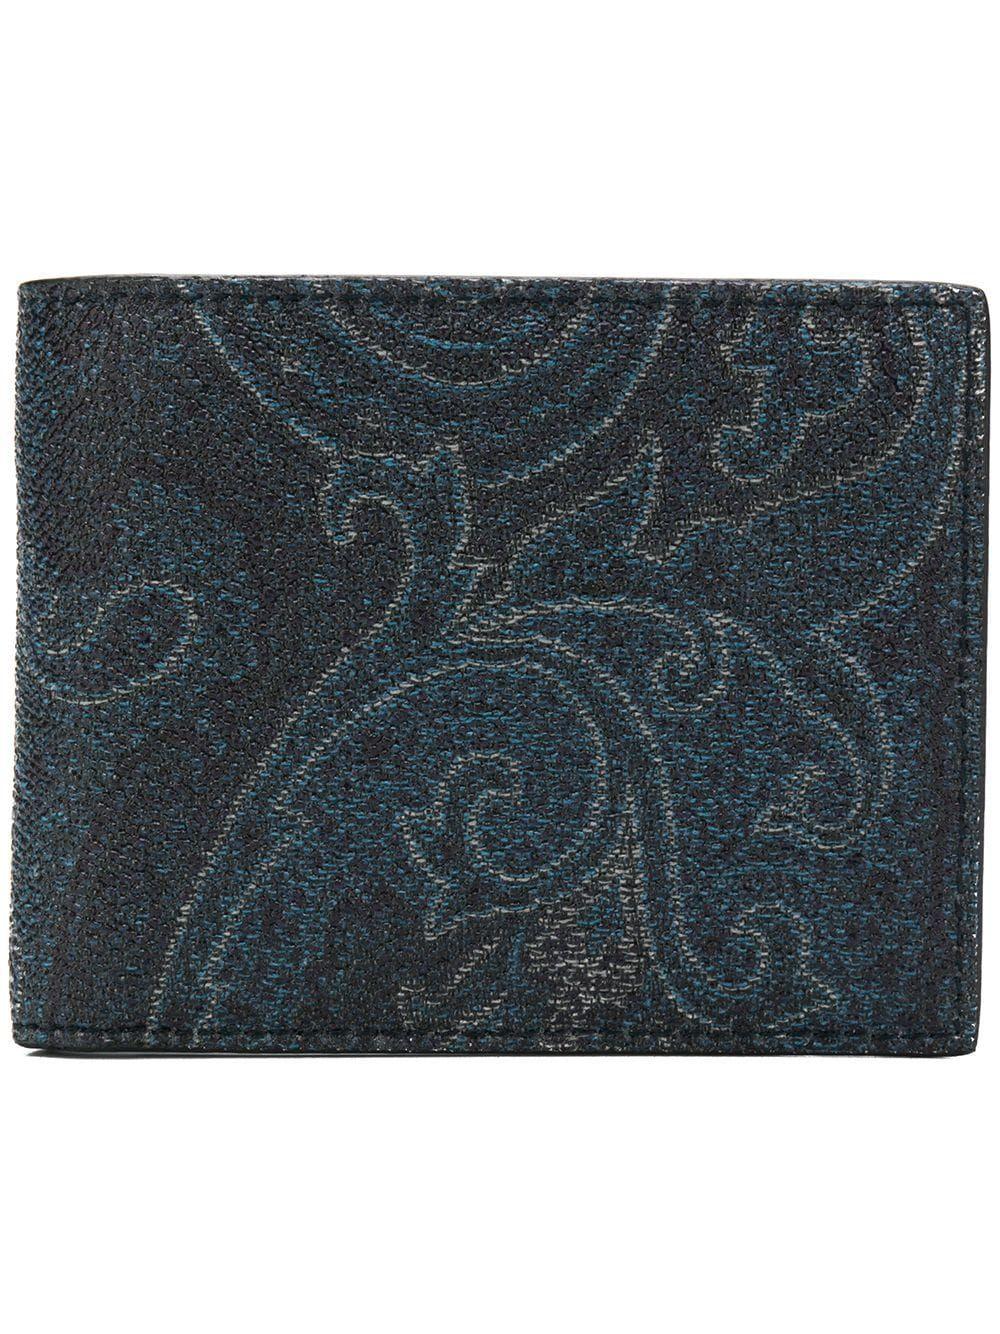 Etro portafogli blu